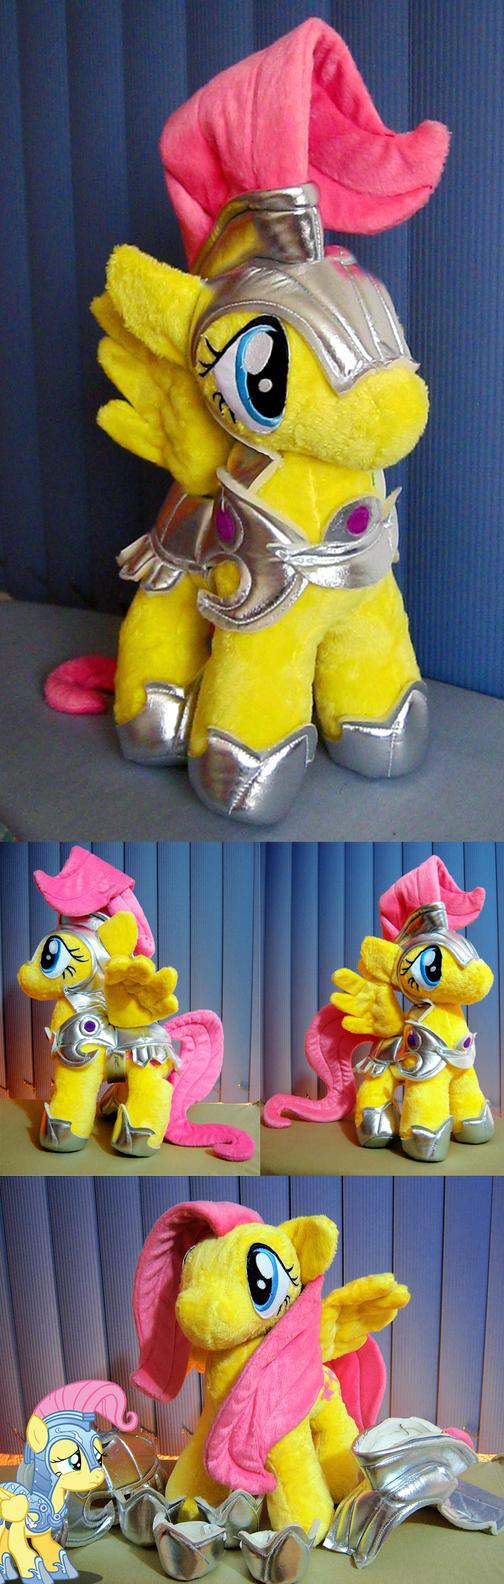 Fluttershy in Shining Armor OvO by Furboz